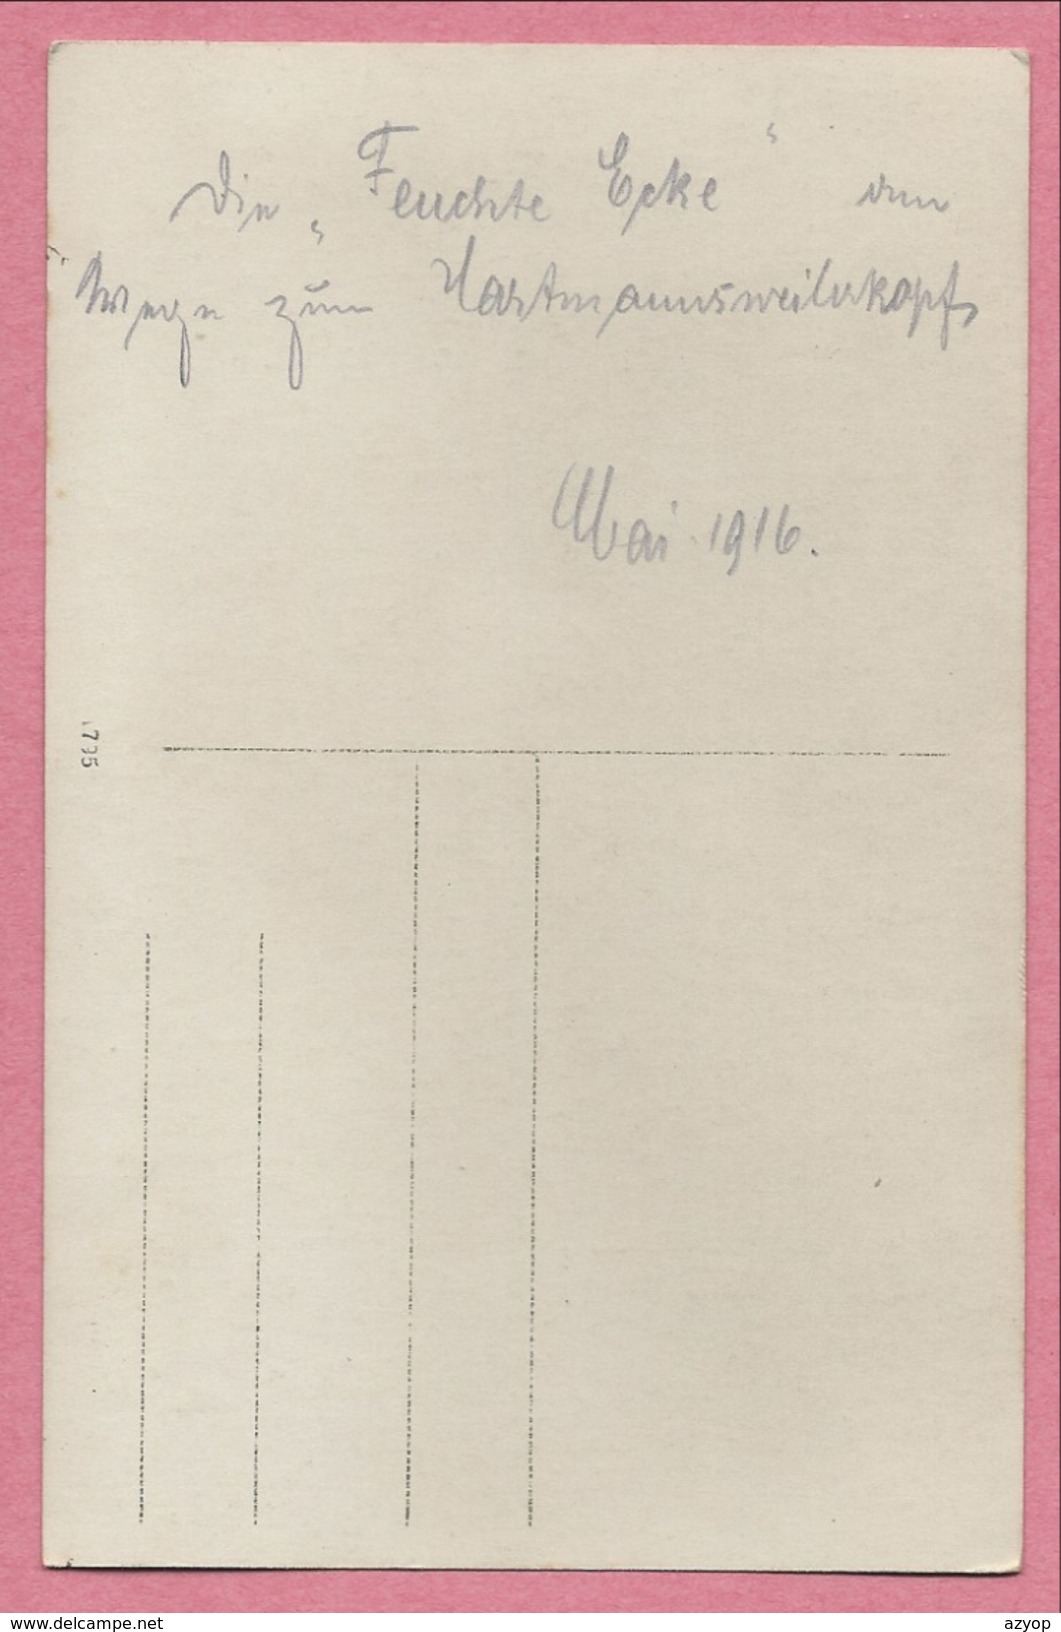 "68 - HARTMANNSWEILERKOPF - VIEIL ARMAND - Carte Photo Allemande - Soldats Allemands - "" Feuchte Ecke "" - Guerre 14/18 - Francia"